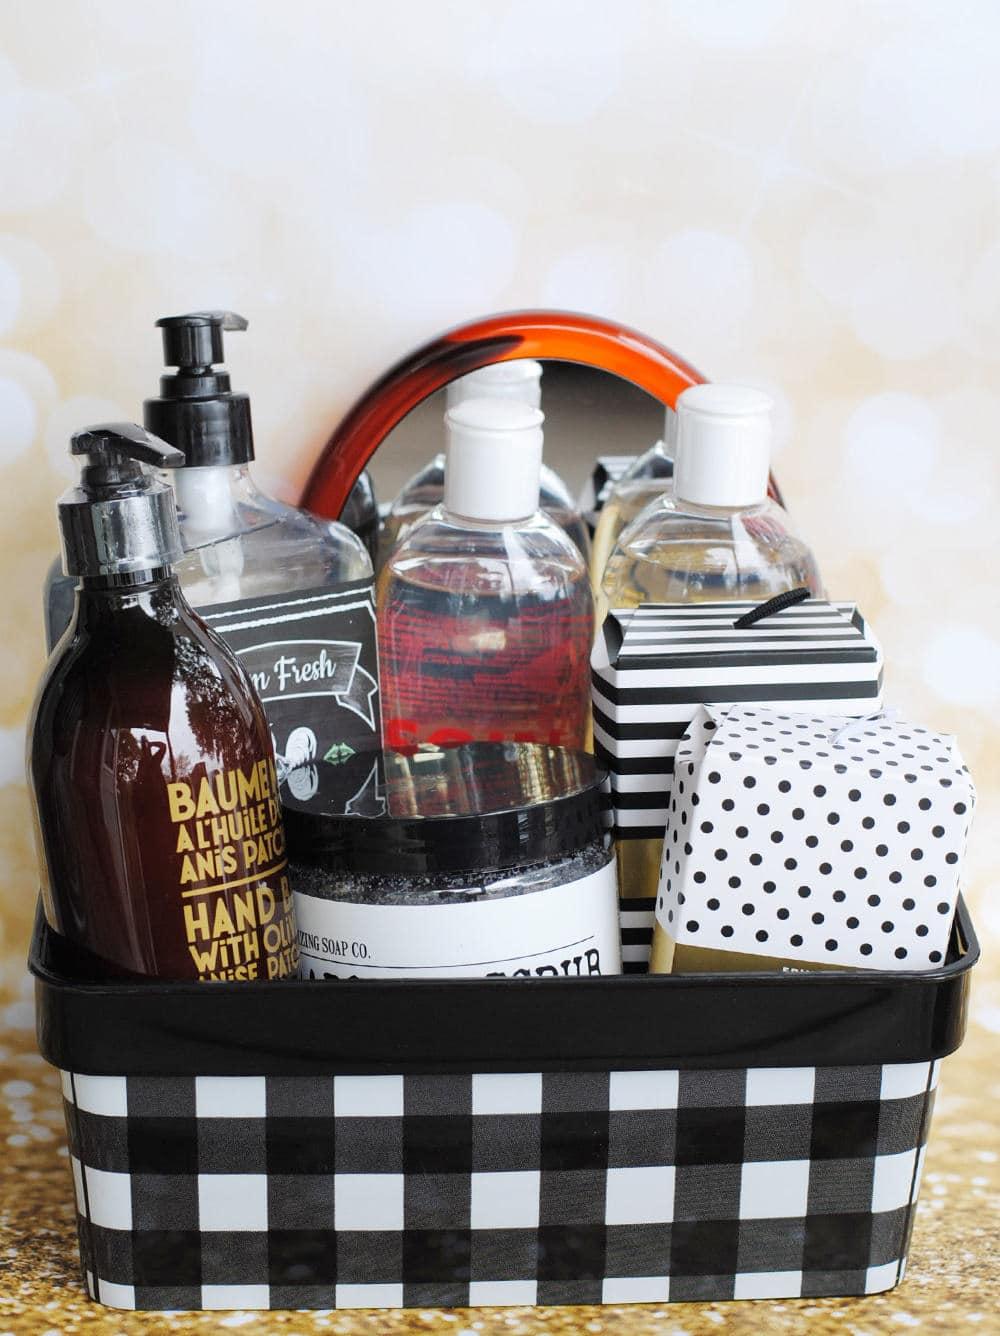 Cute Gift Baskets for Teenage Girls featuring Tuesday Morning #shopping #holidays #Christmas #Hanukkah #presents #gifts #forher #bathandbody #beauty #hair #makeup #teenager #teenagegirl